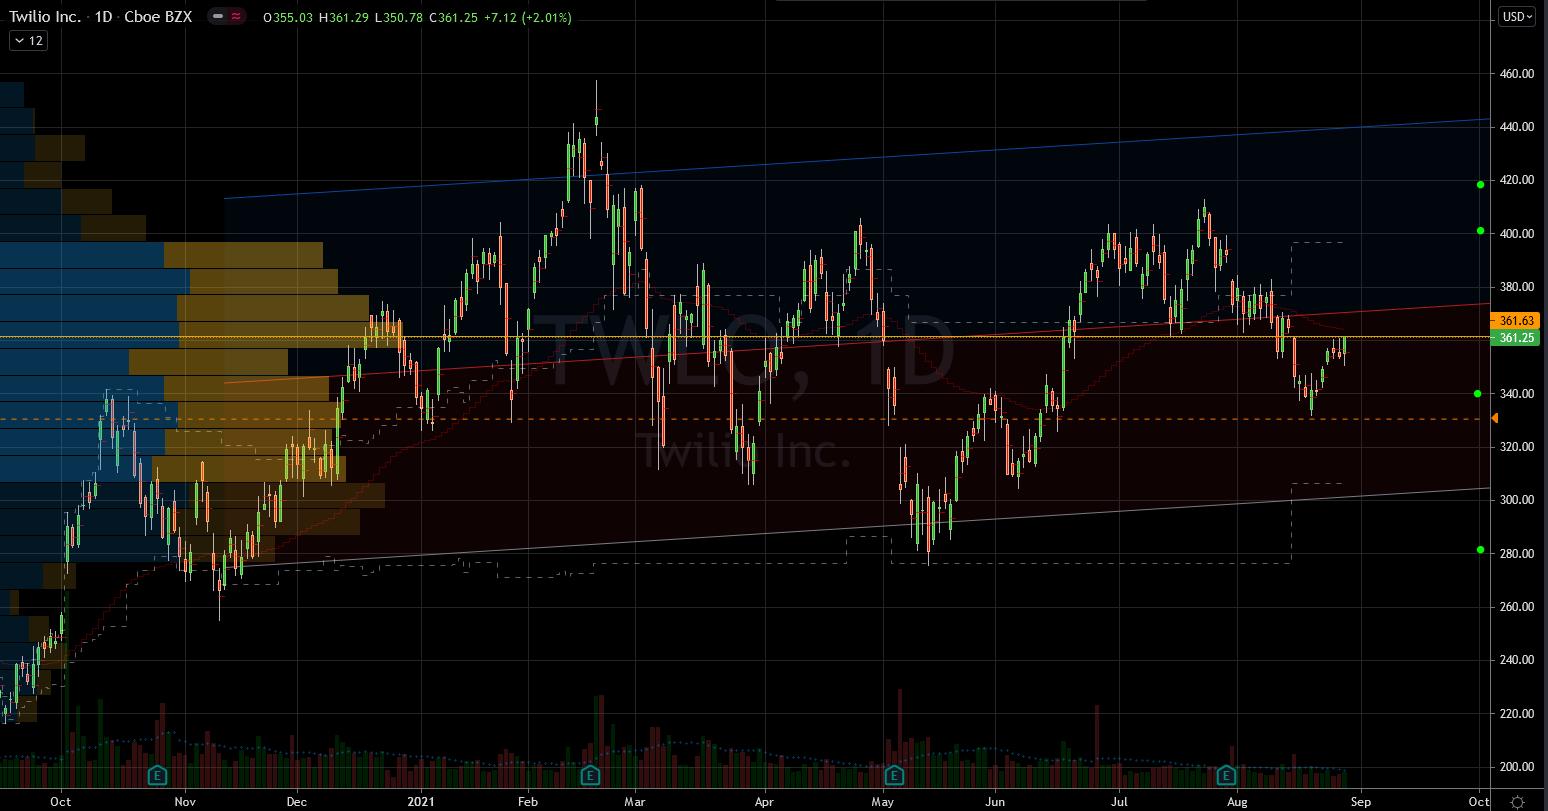 Stocks to buy: Twilio (TWLO) Stock Chart Showing Potential Base